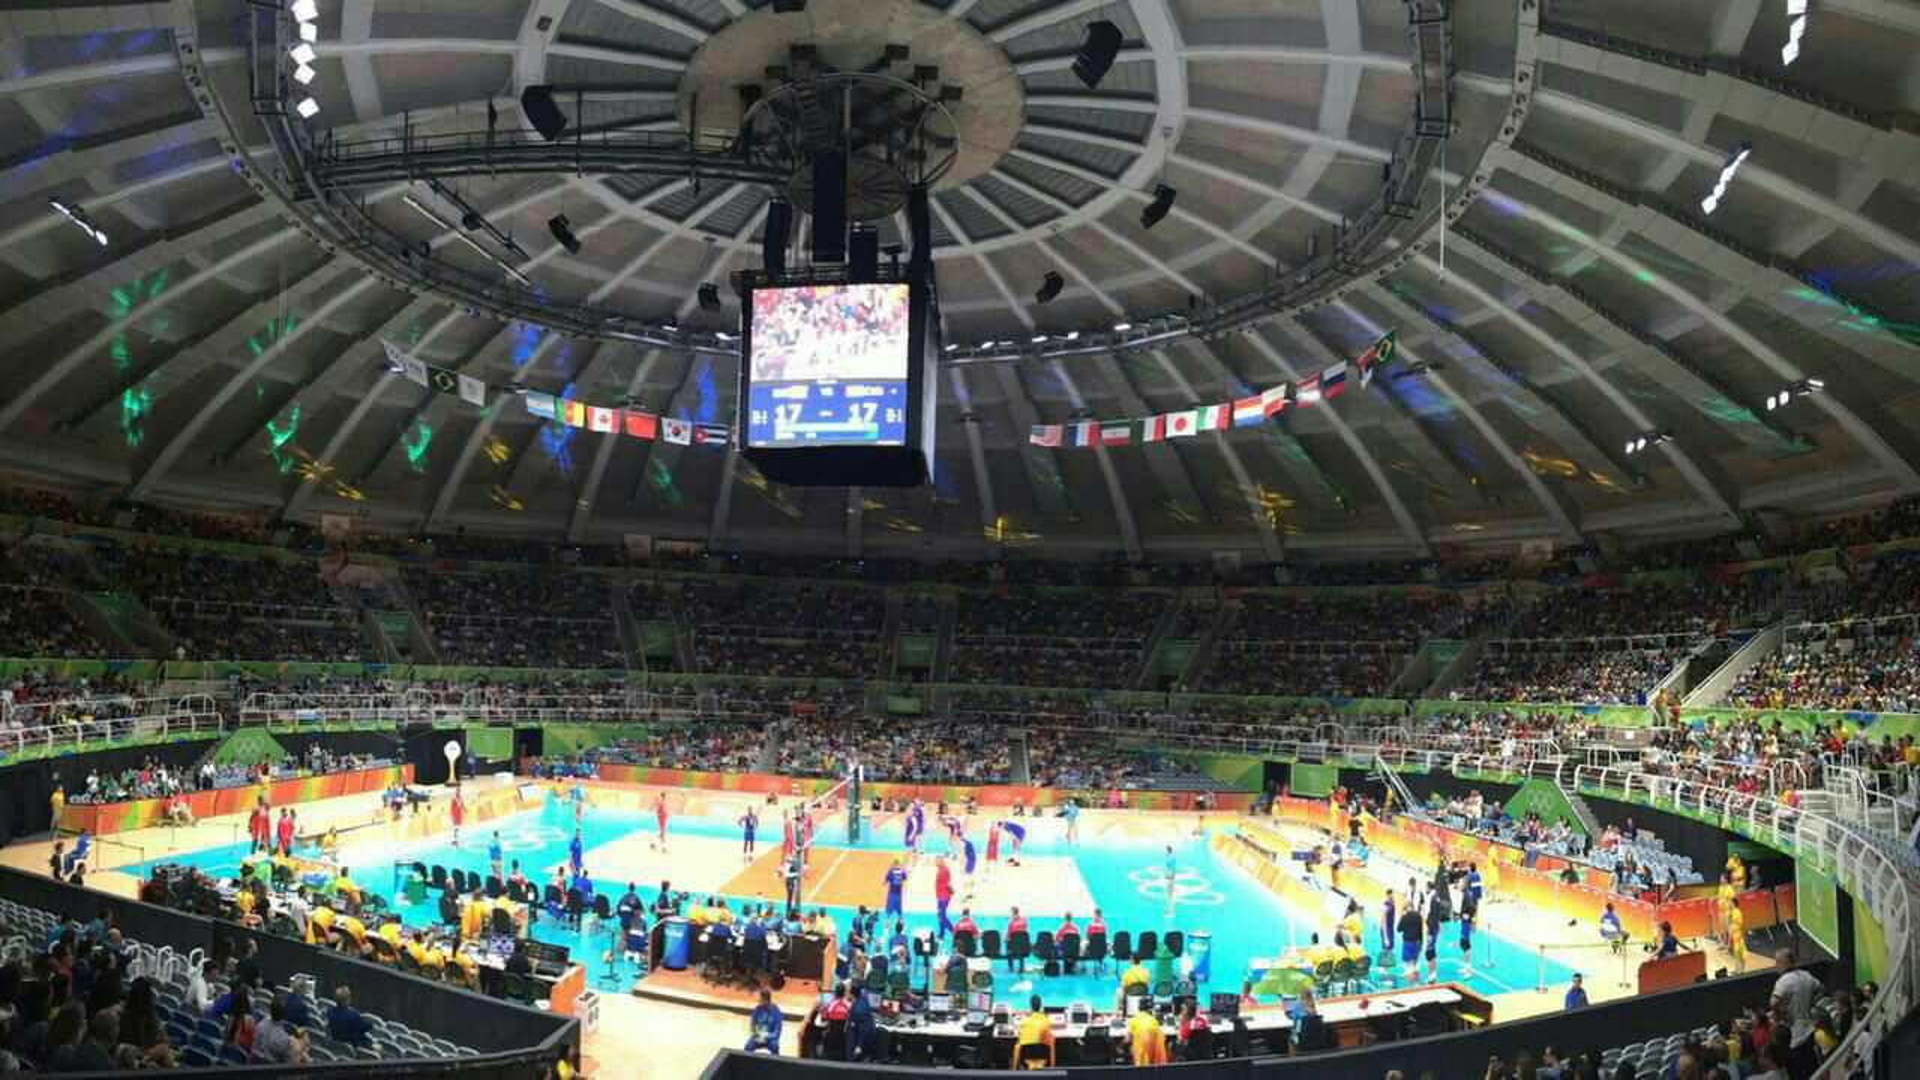 فیلم لحظه ورود تیم ملی والیبال ایران به سالن مسابقه والیبال المپیک ریو